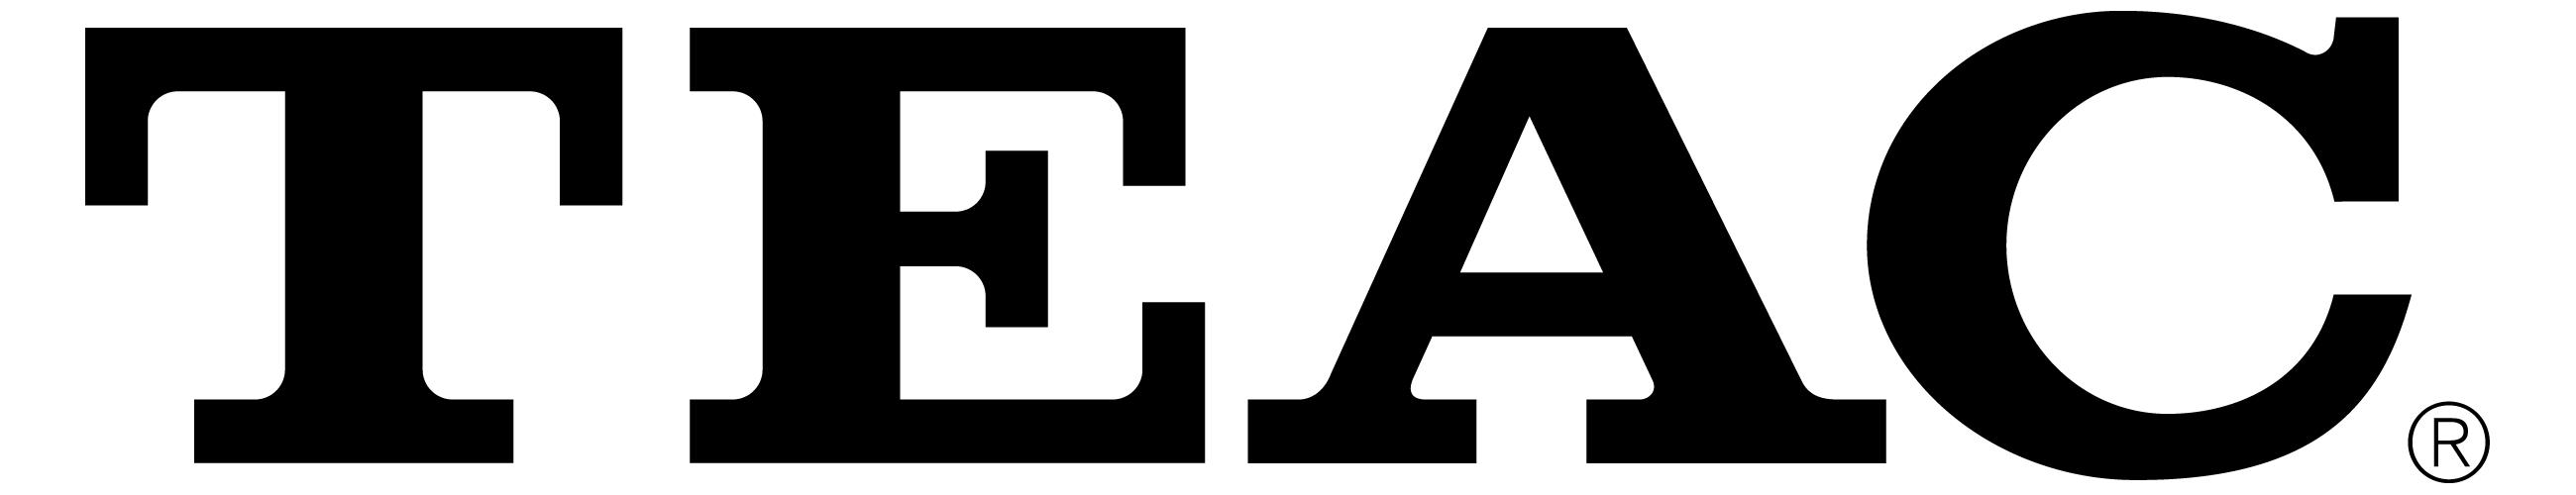 TEAC_logo